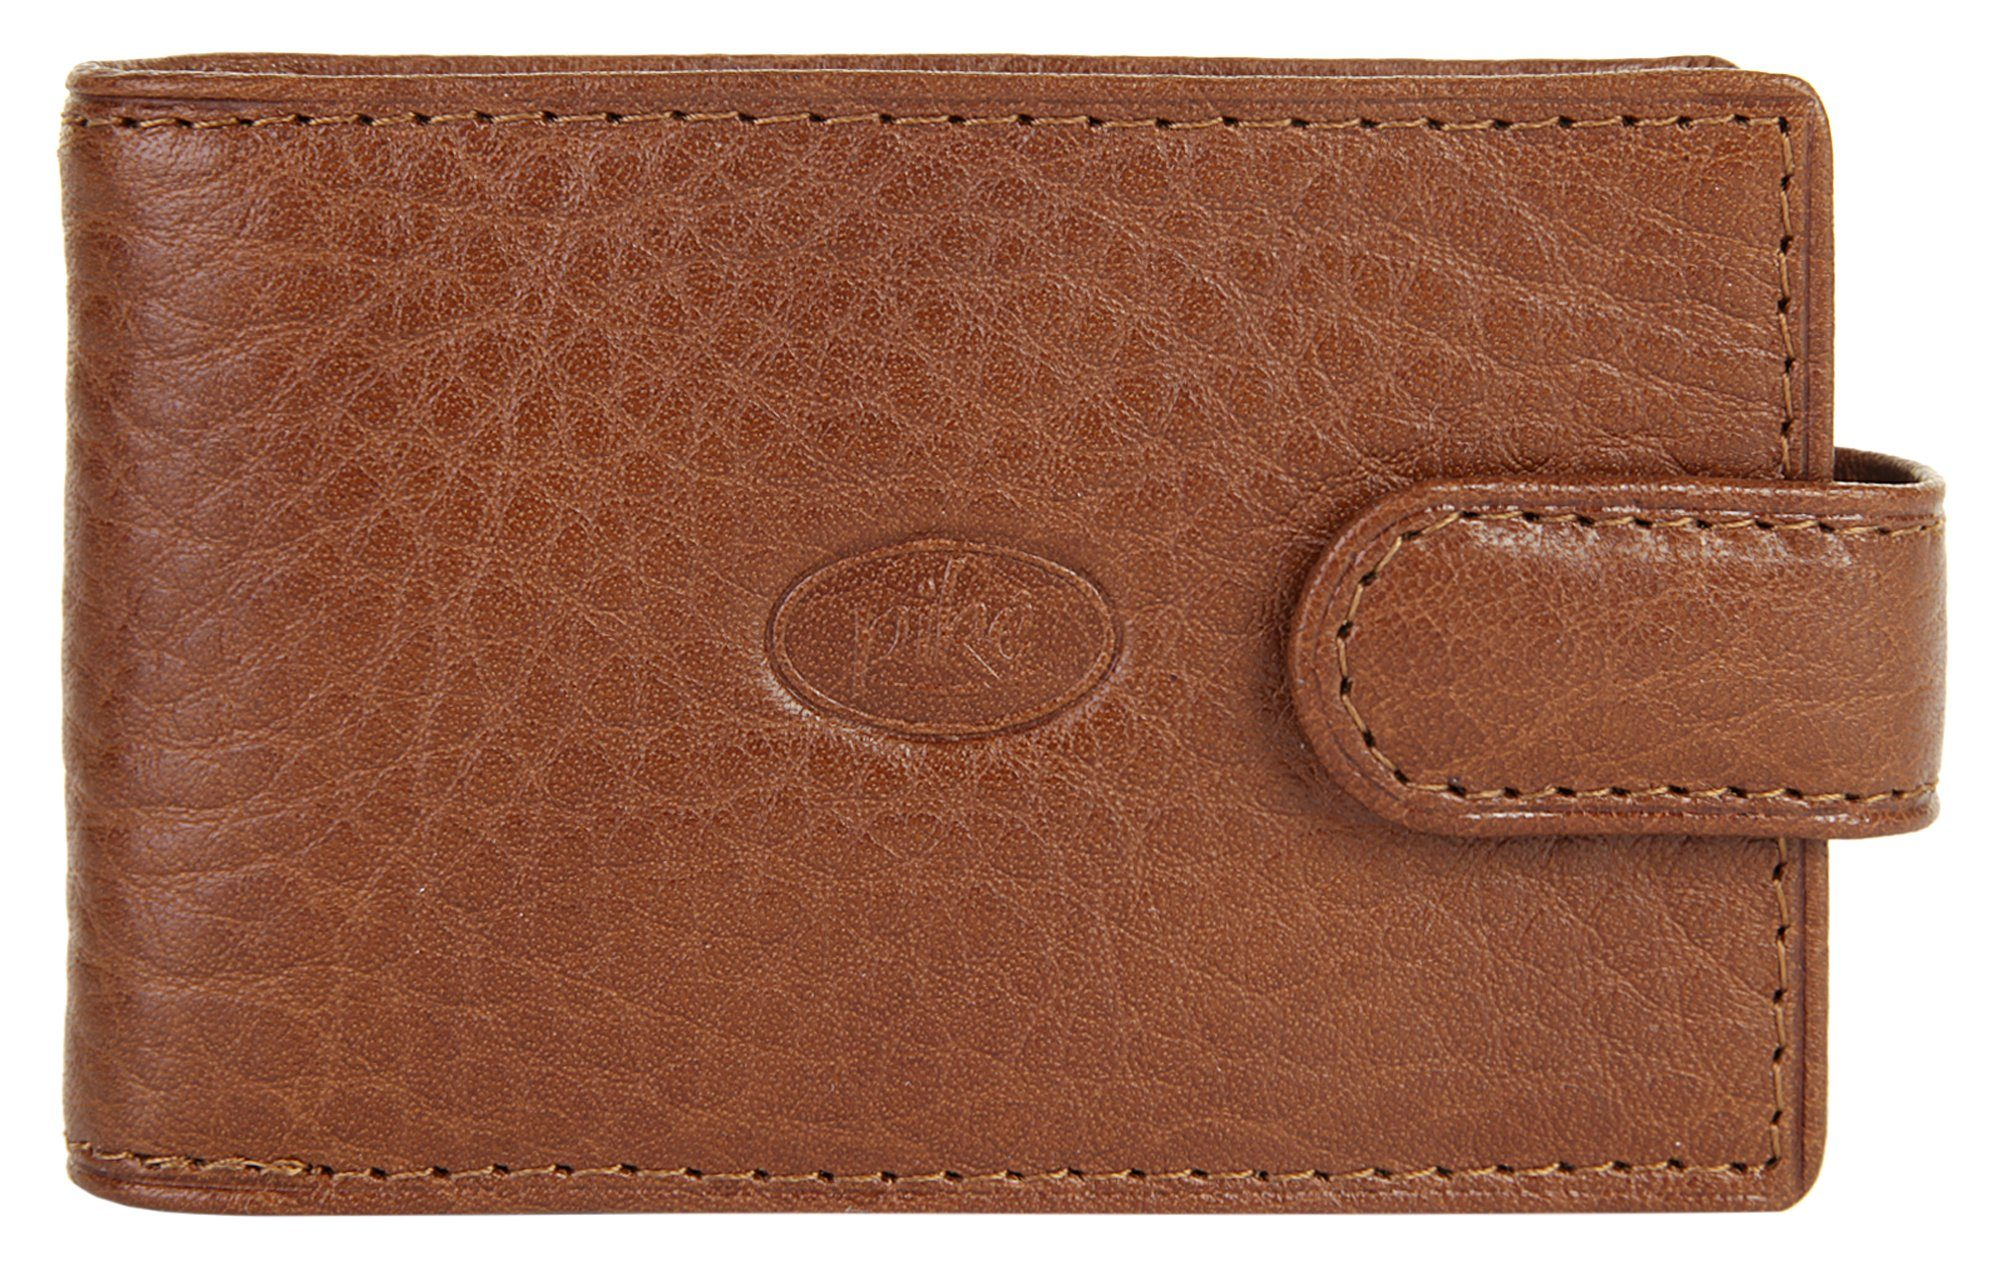 Piké Brieftasche, Kreditkartenfächer